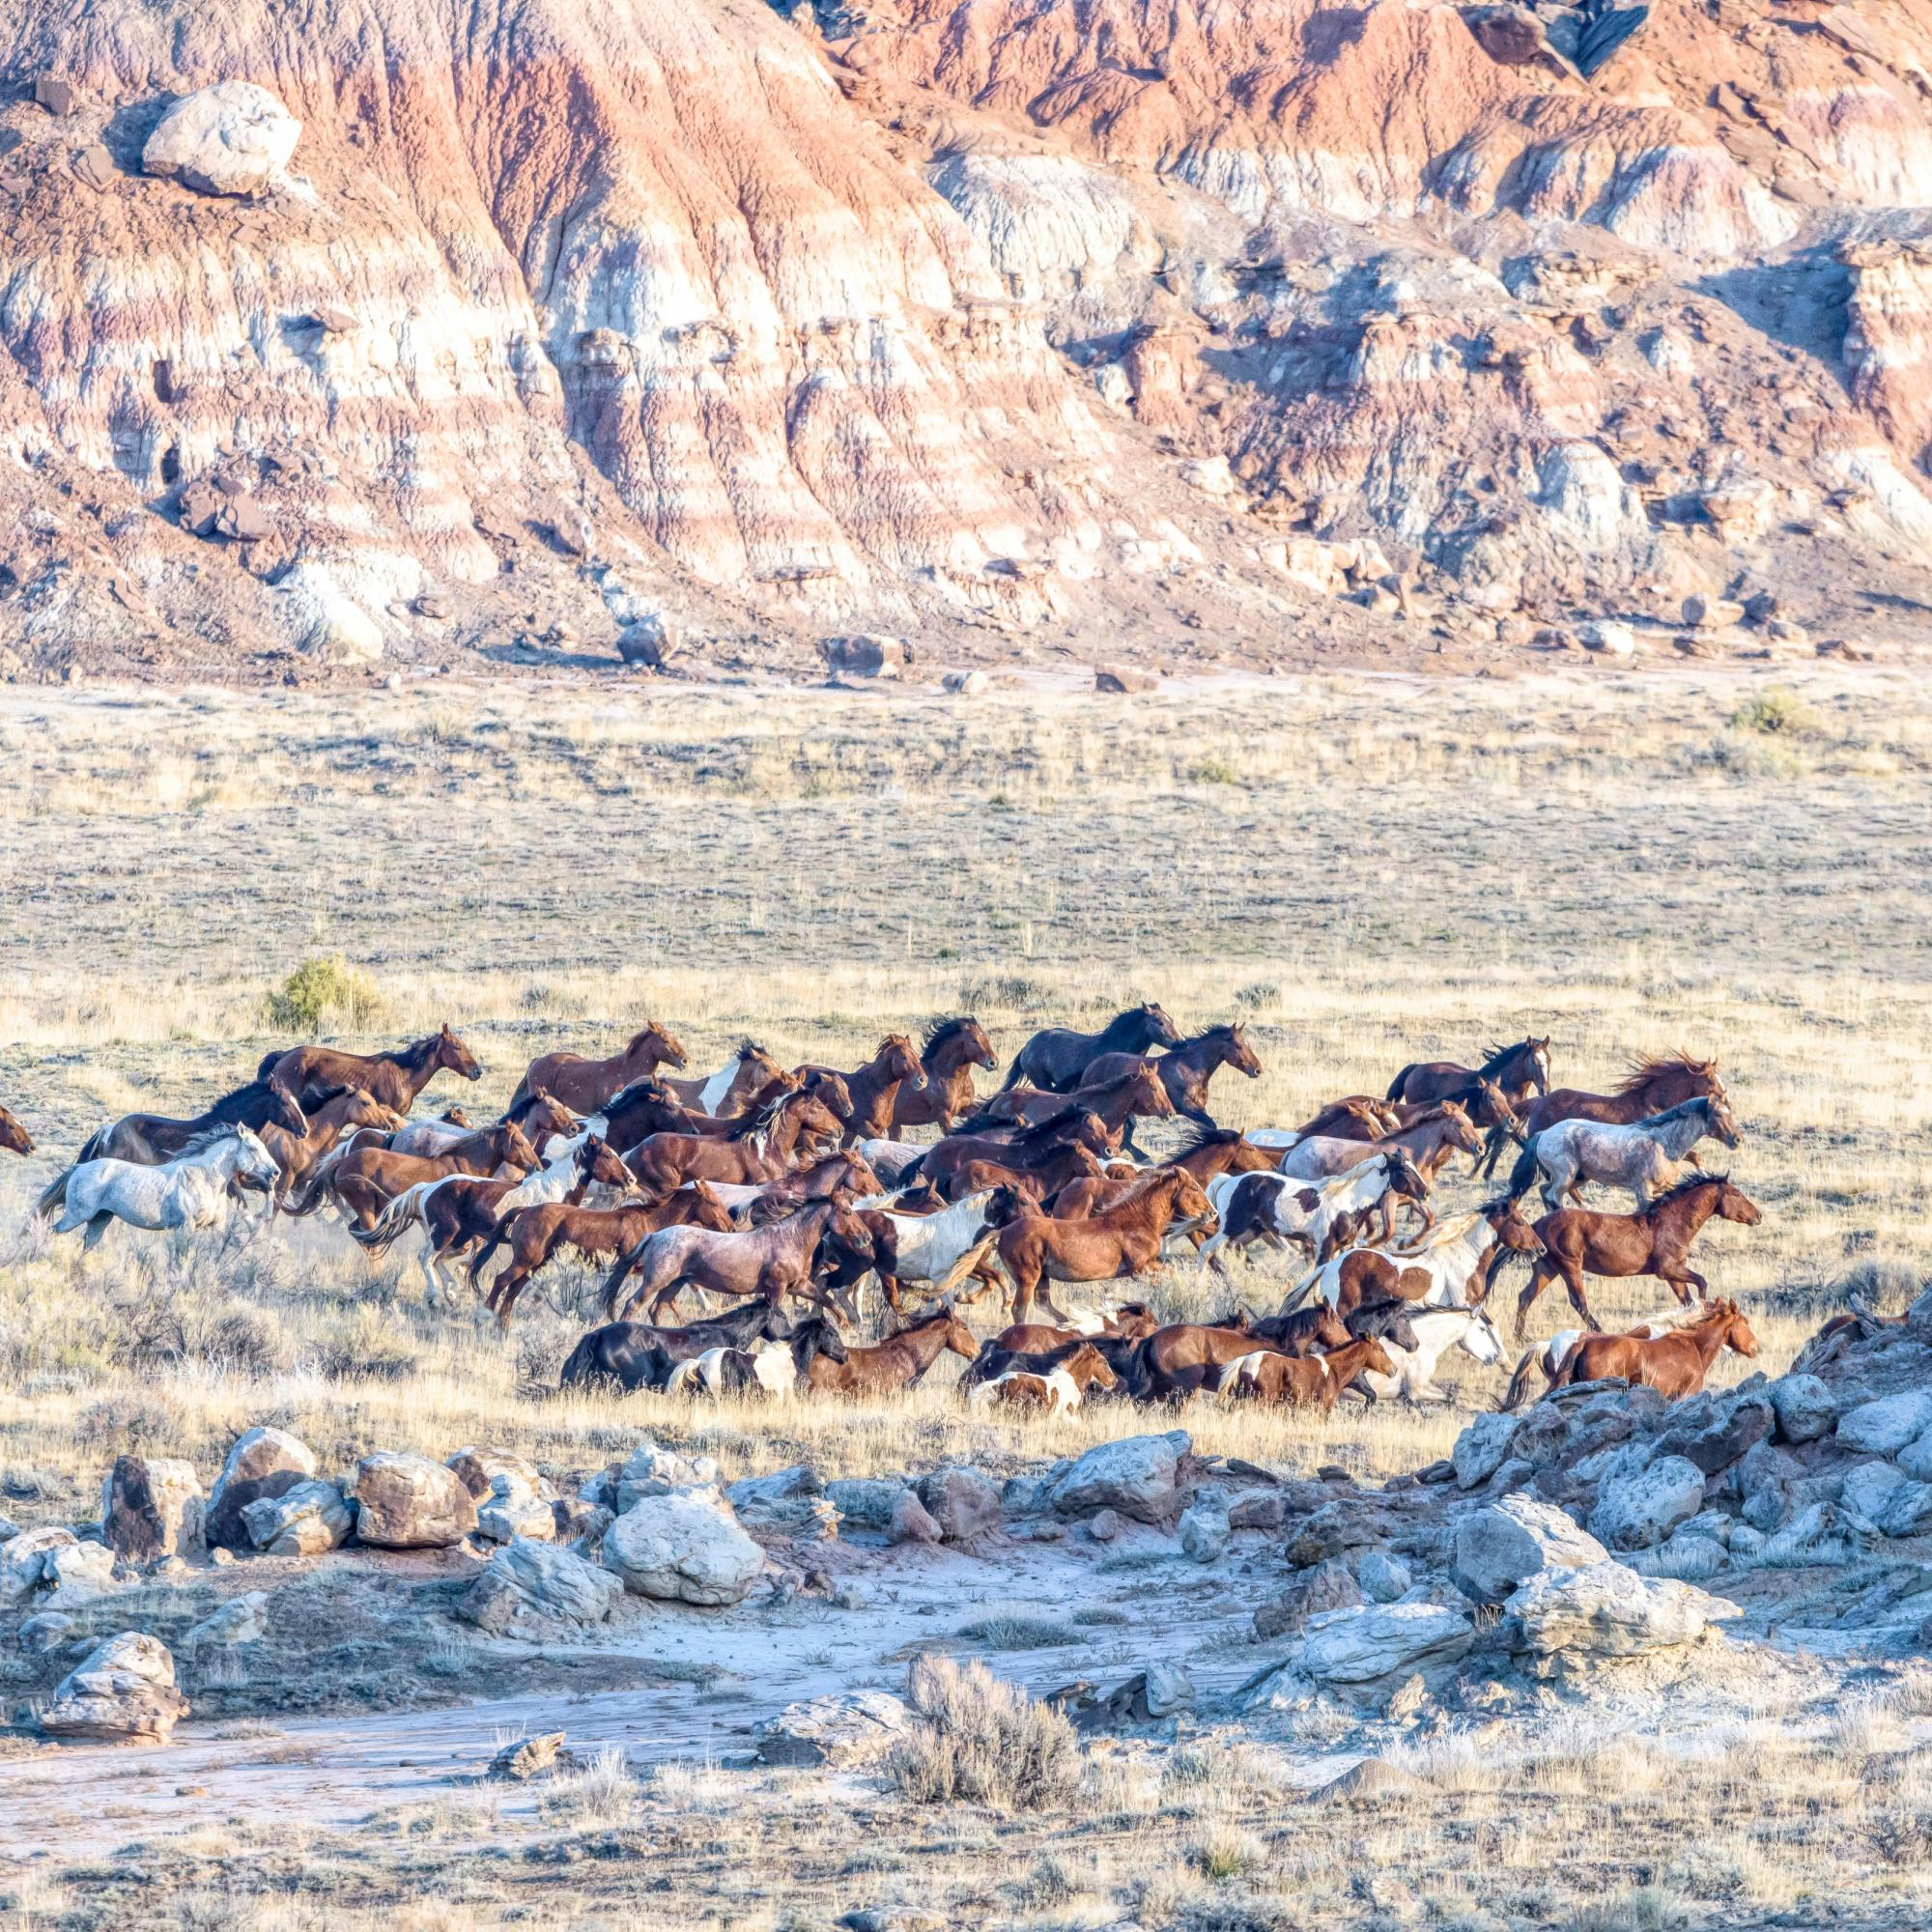 Fifteenmile HMA Wild Horses